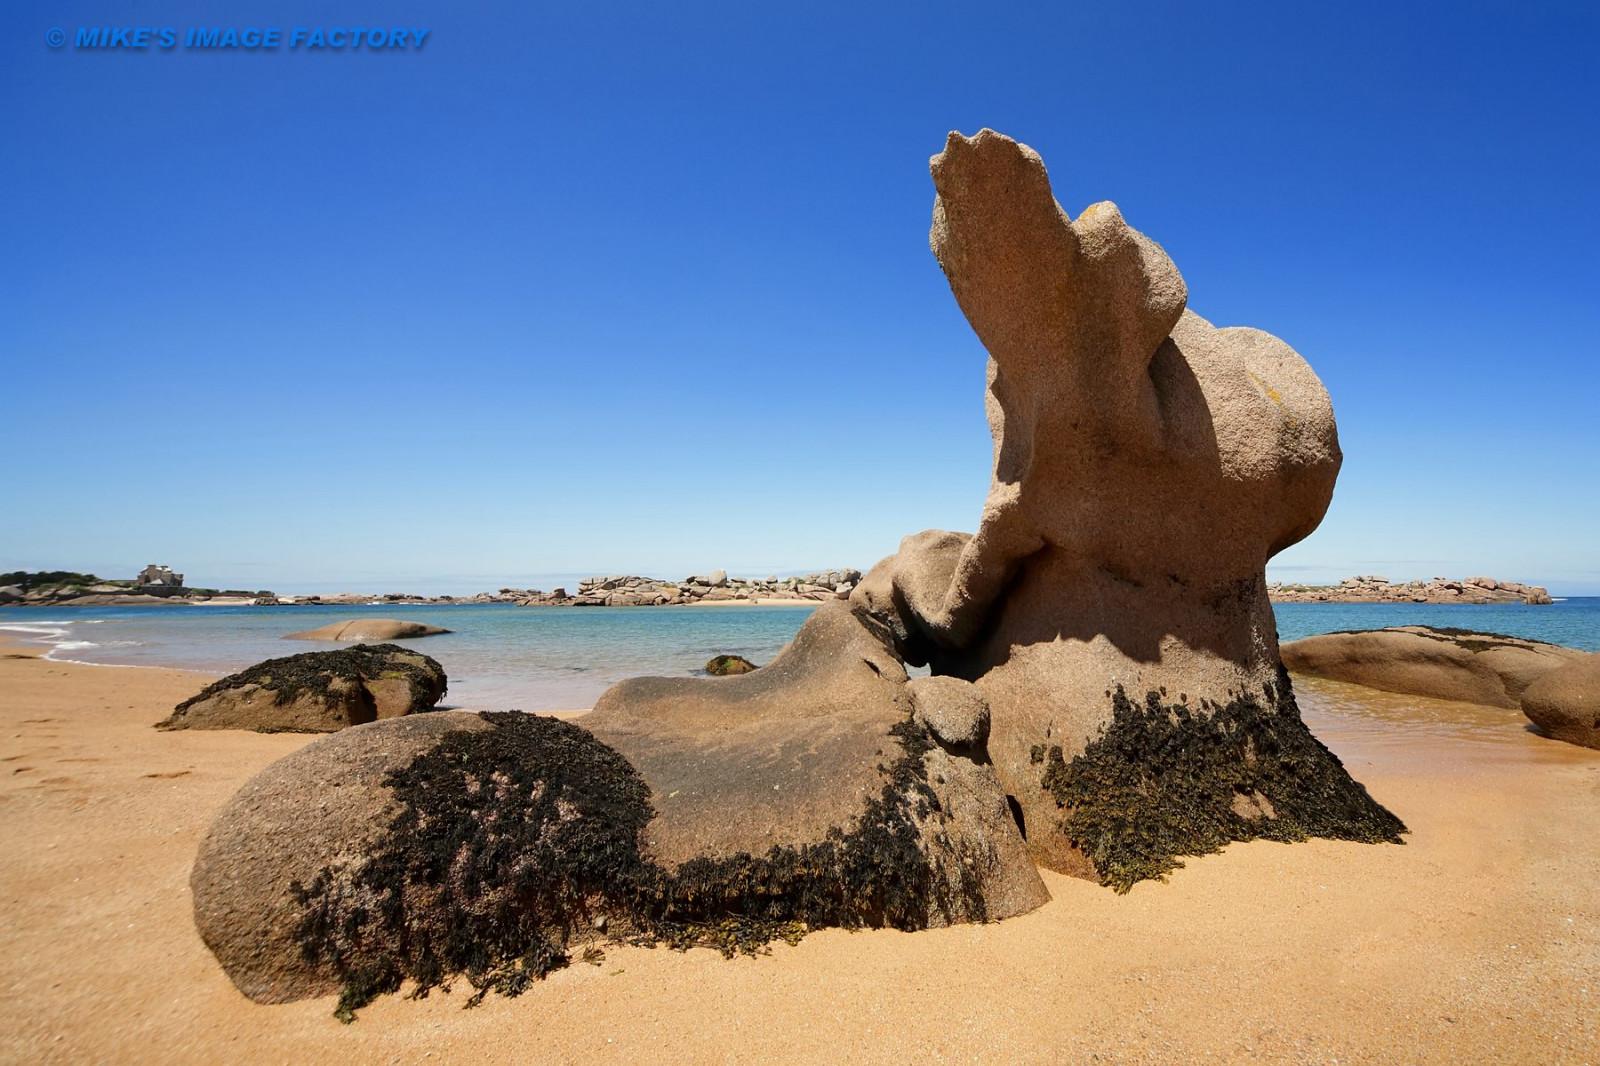 Fondos de pantalla : paisaje, mar, rock, apuntalar, arena, cielo ...